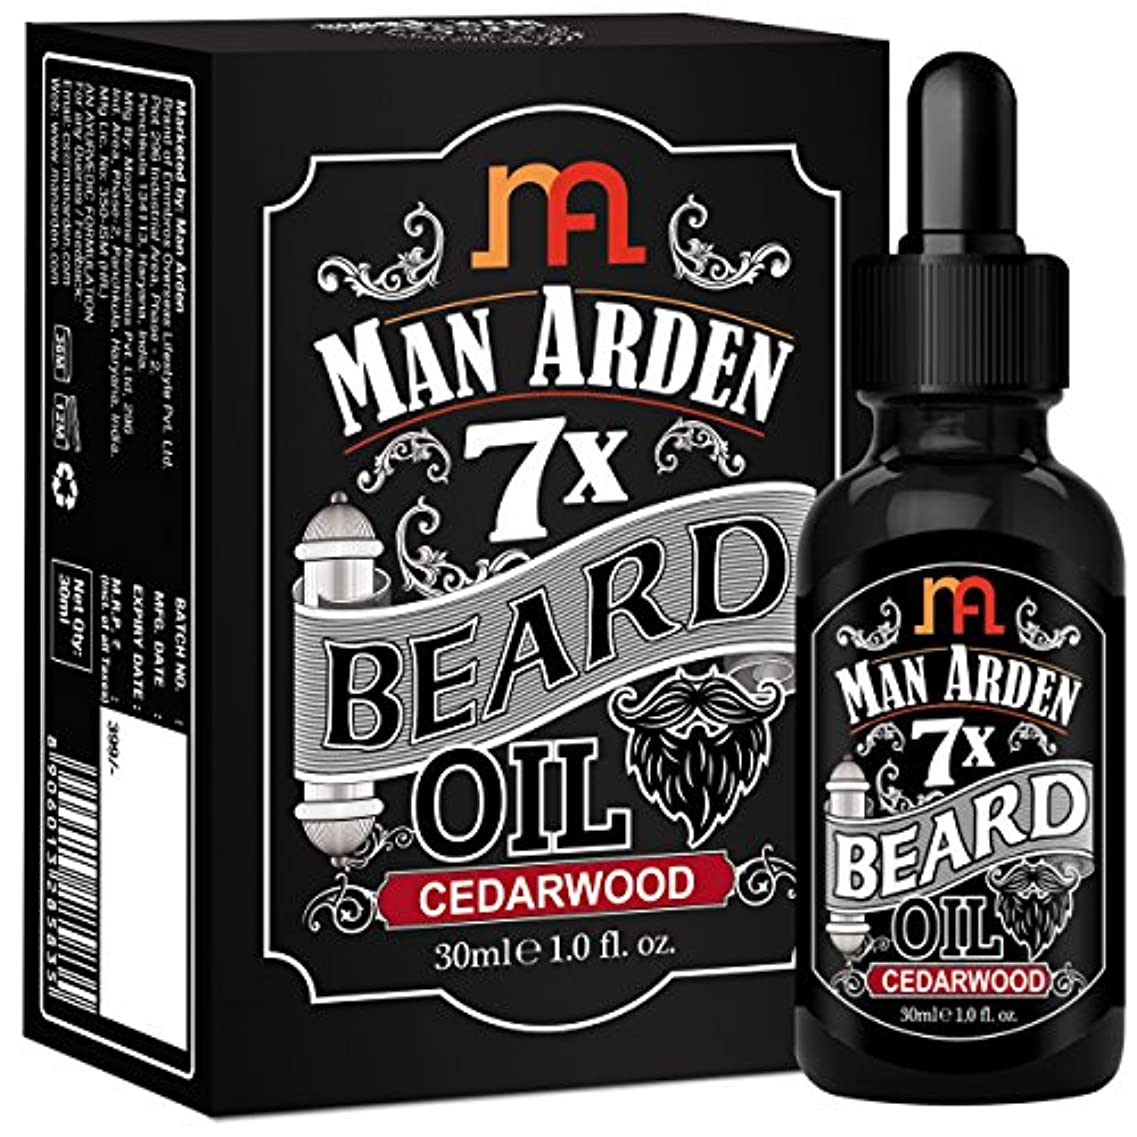 俳優銀河伝染性Man Arden 7X Beard Oil 30ml (Cedarwood) - 7 Premium Oils Blend For Beard Growth & Nourishment